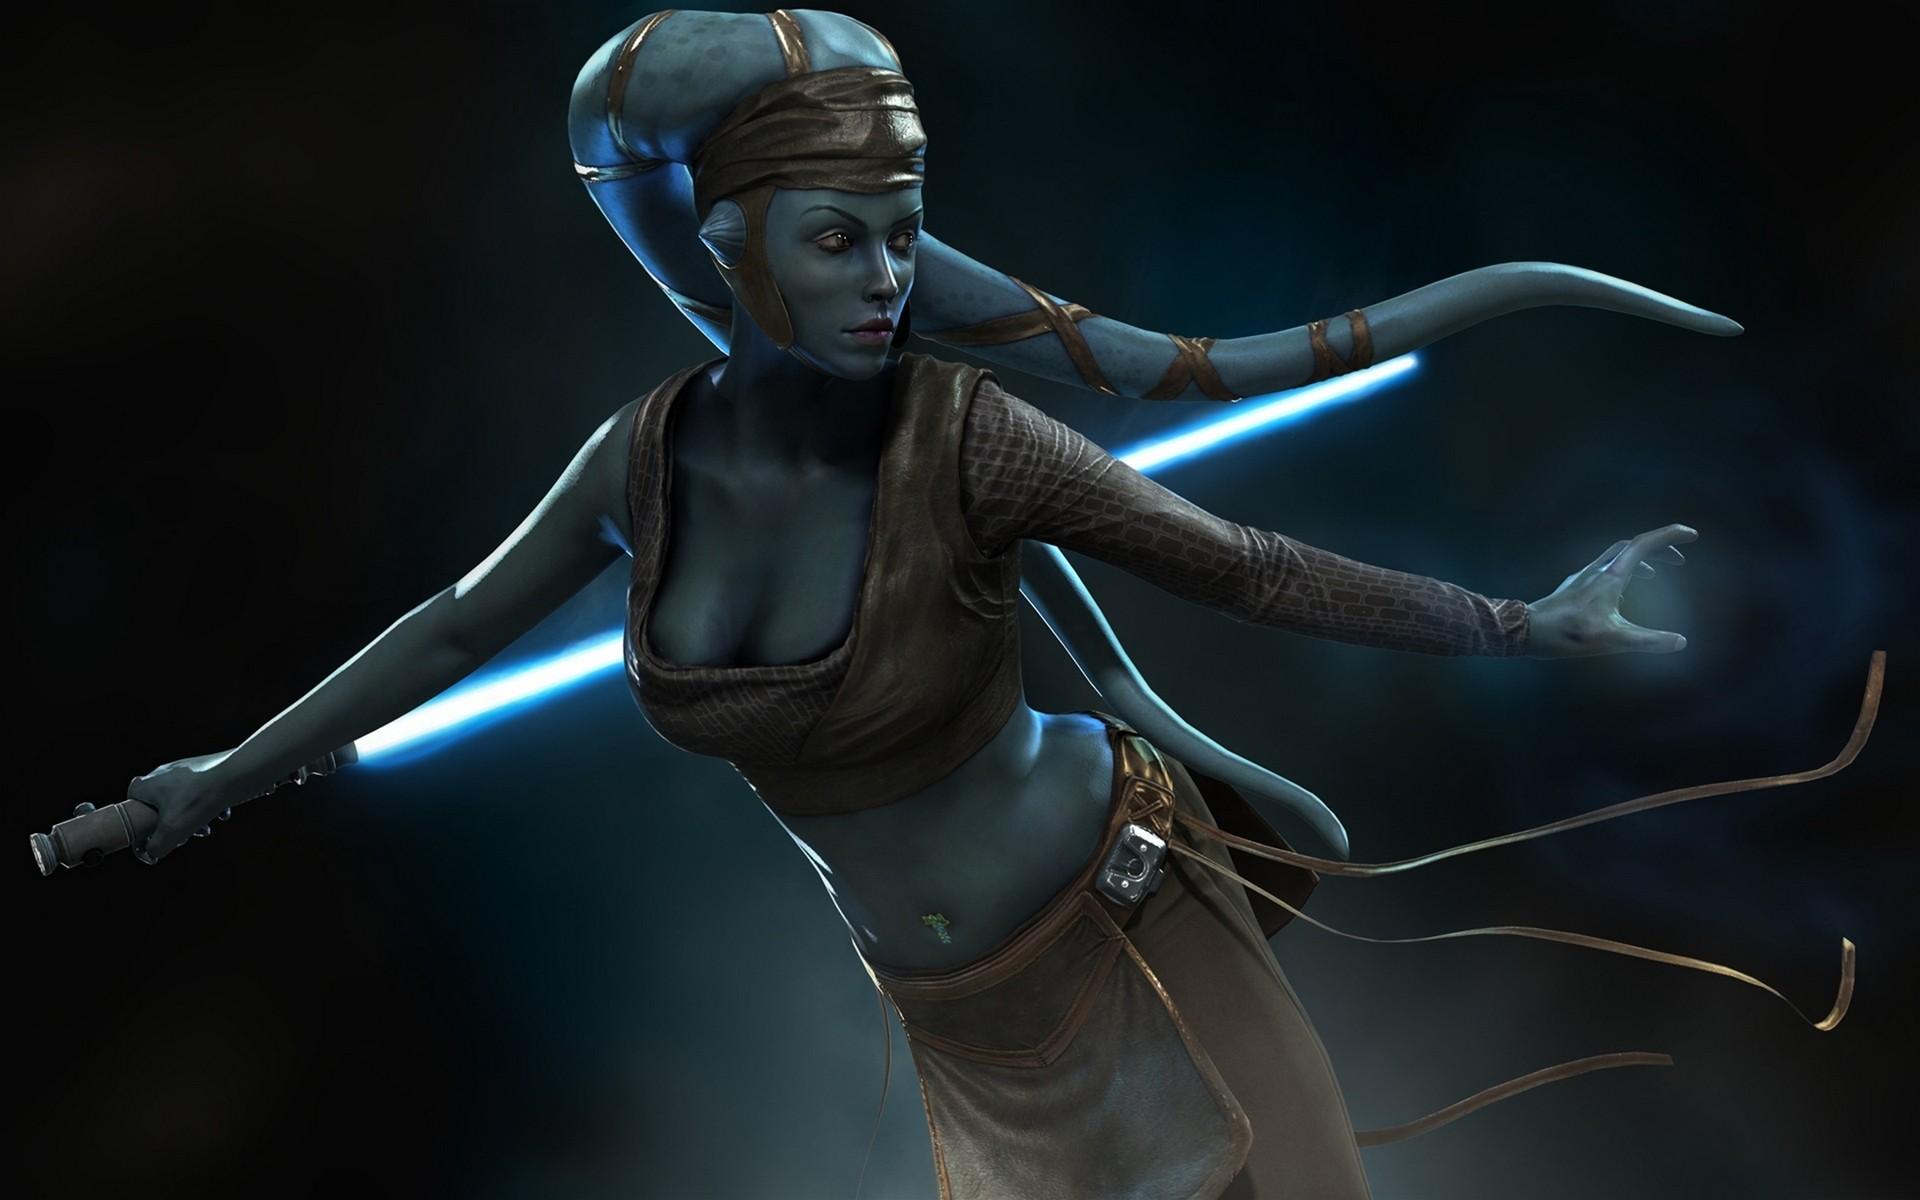 Star Wars Warriors Aliens Games 3D Graphics Fantasy warrior sci-fi .